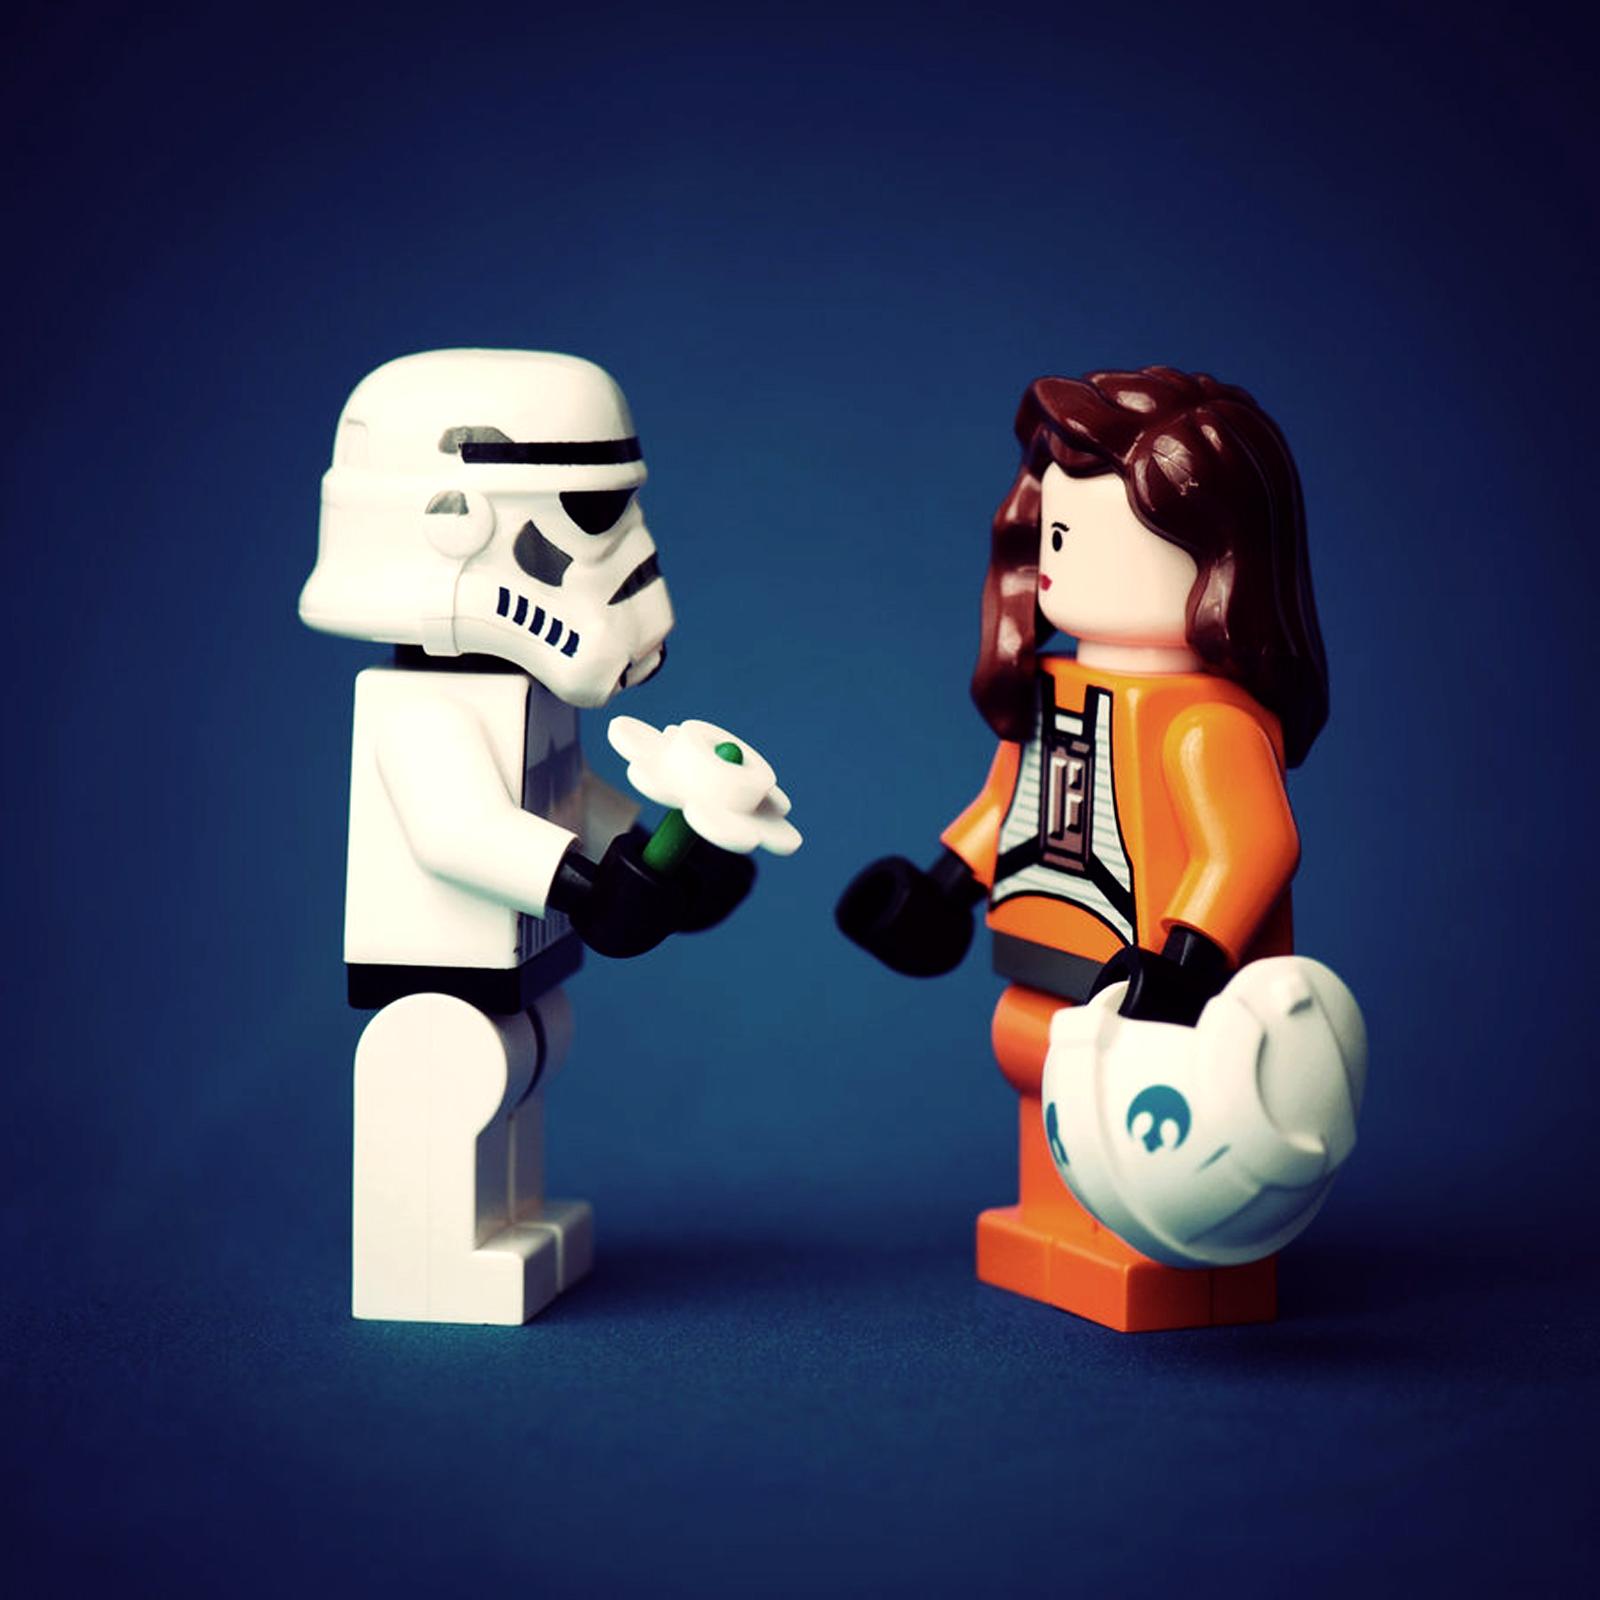 Lego Stormtrooper Wallpaper